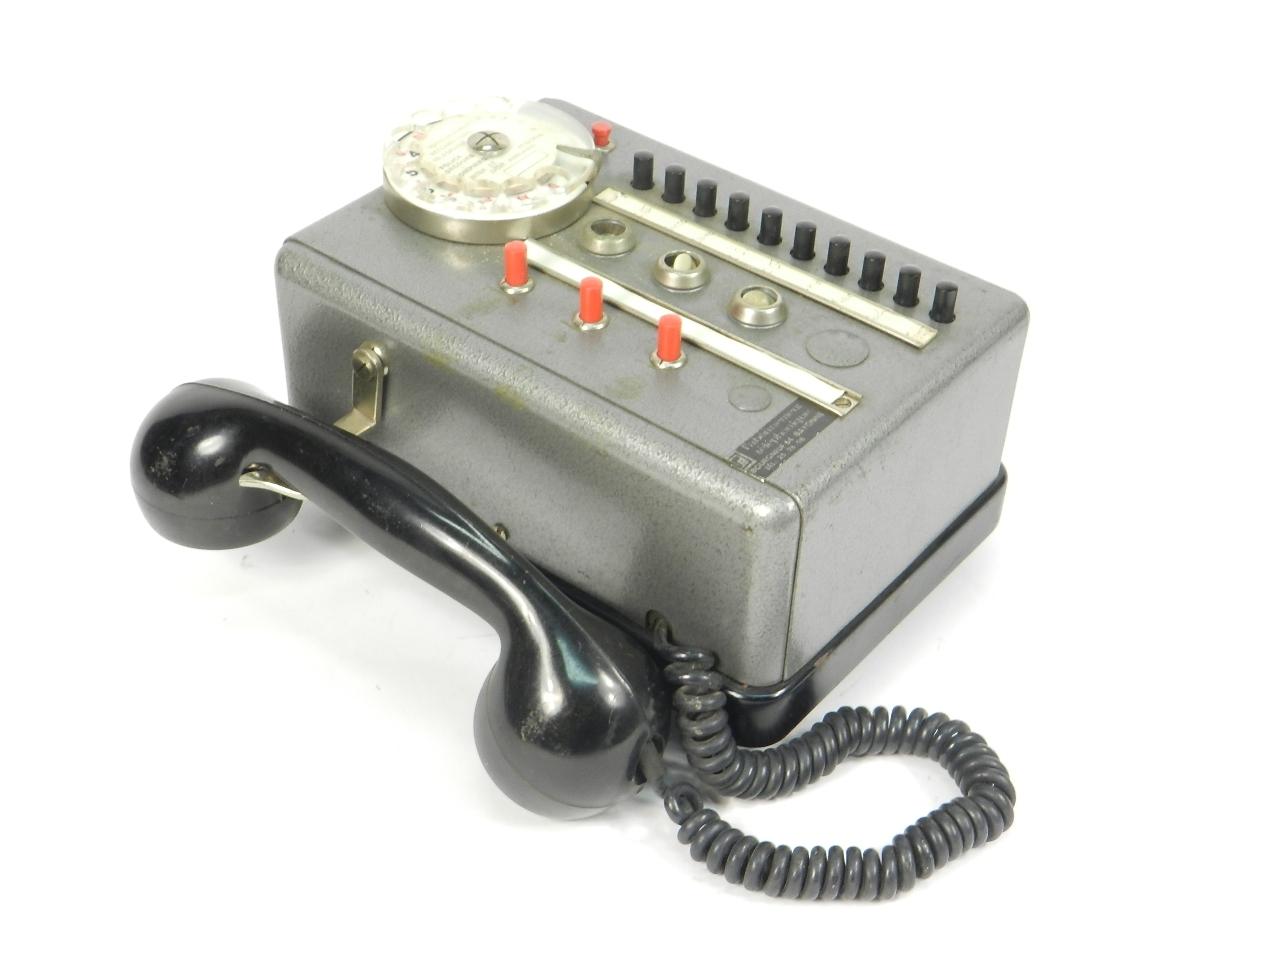 Imagen TELEFONO TÉLIC AÑO 1950, ESTRASBURGO 41685